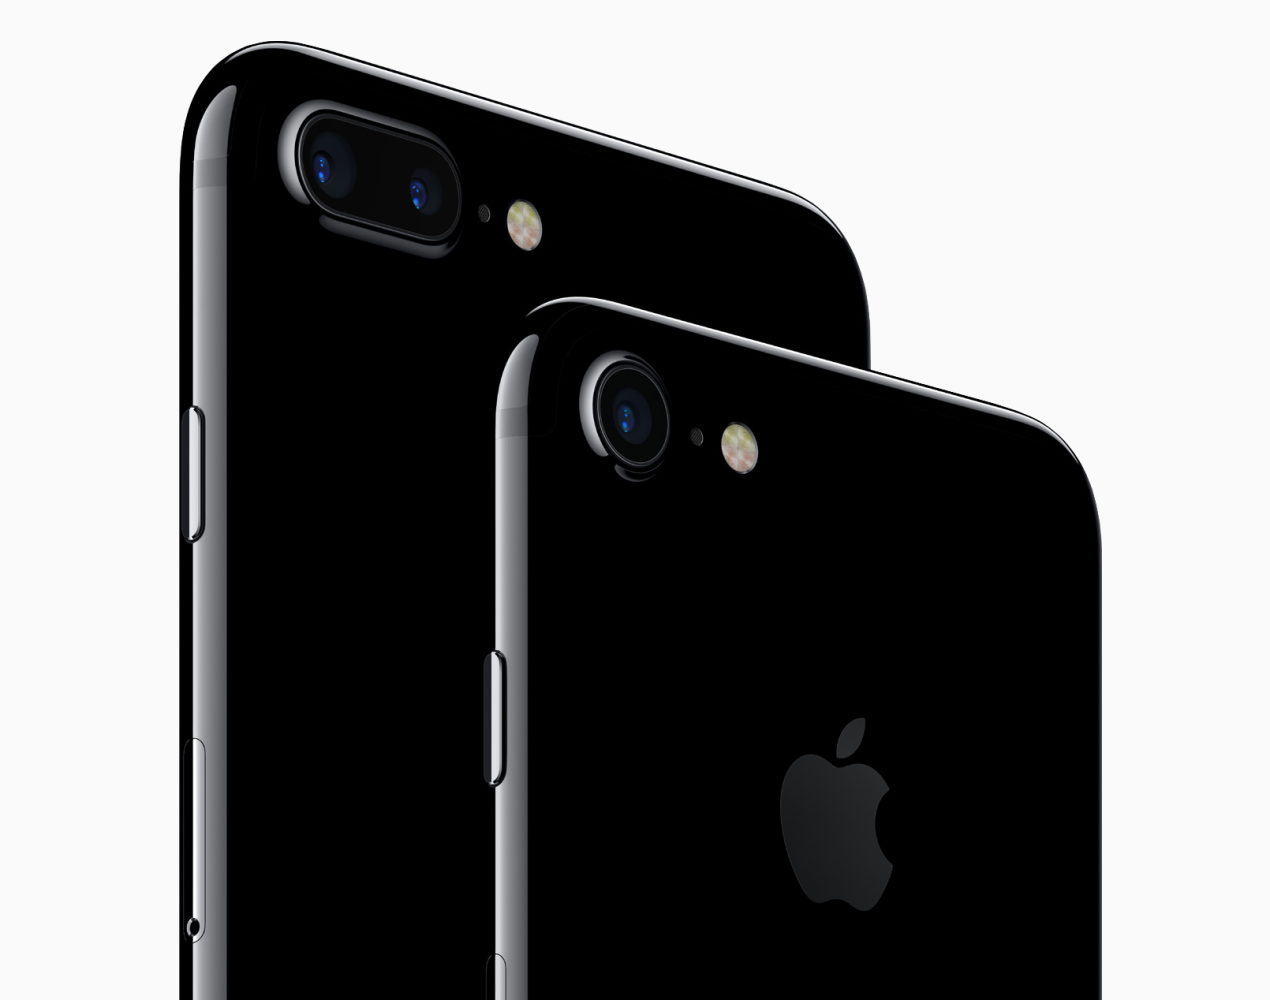 Apple iPhone 7 Plus og iPhone 7